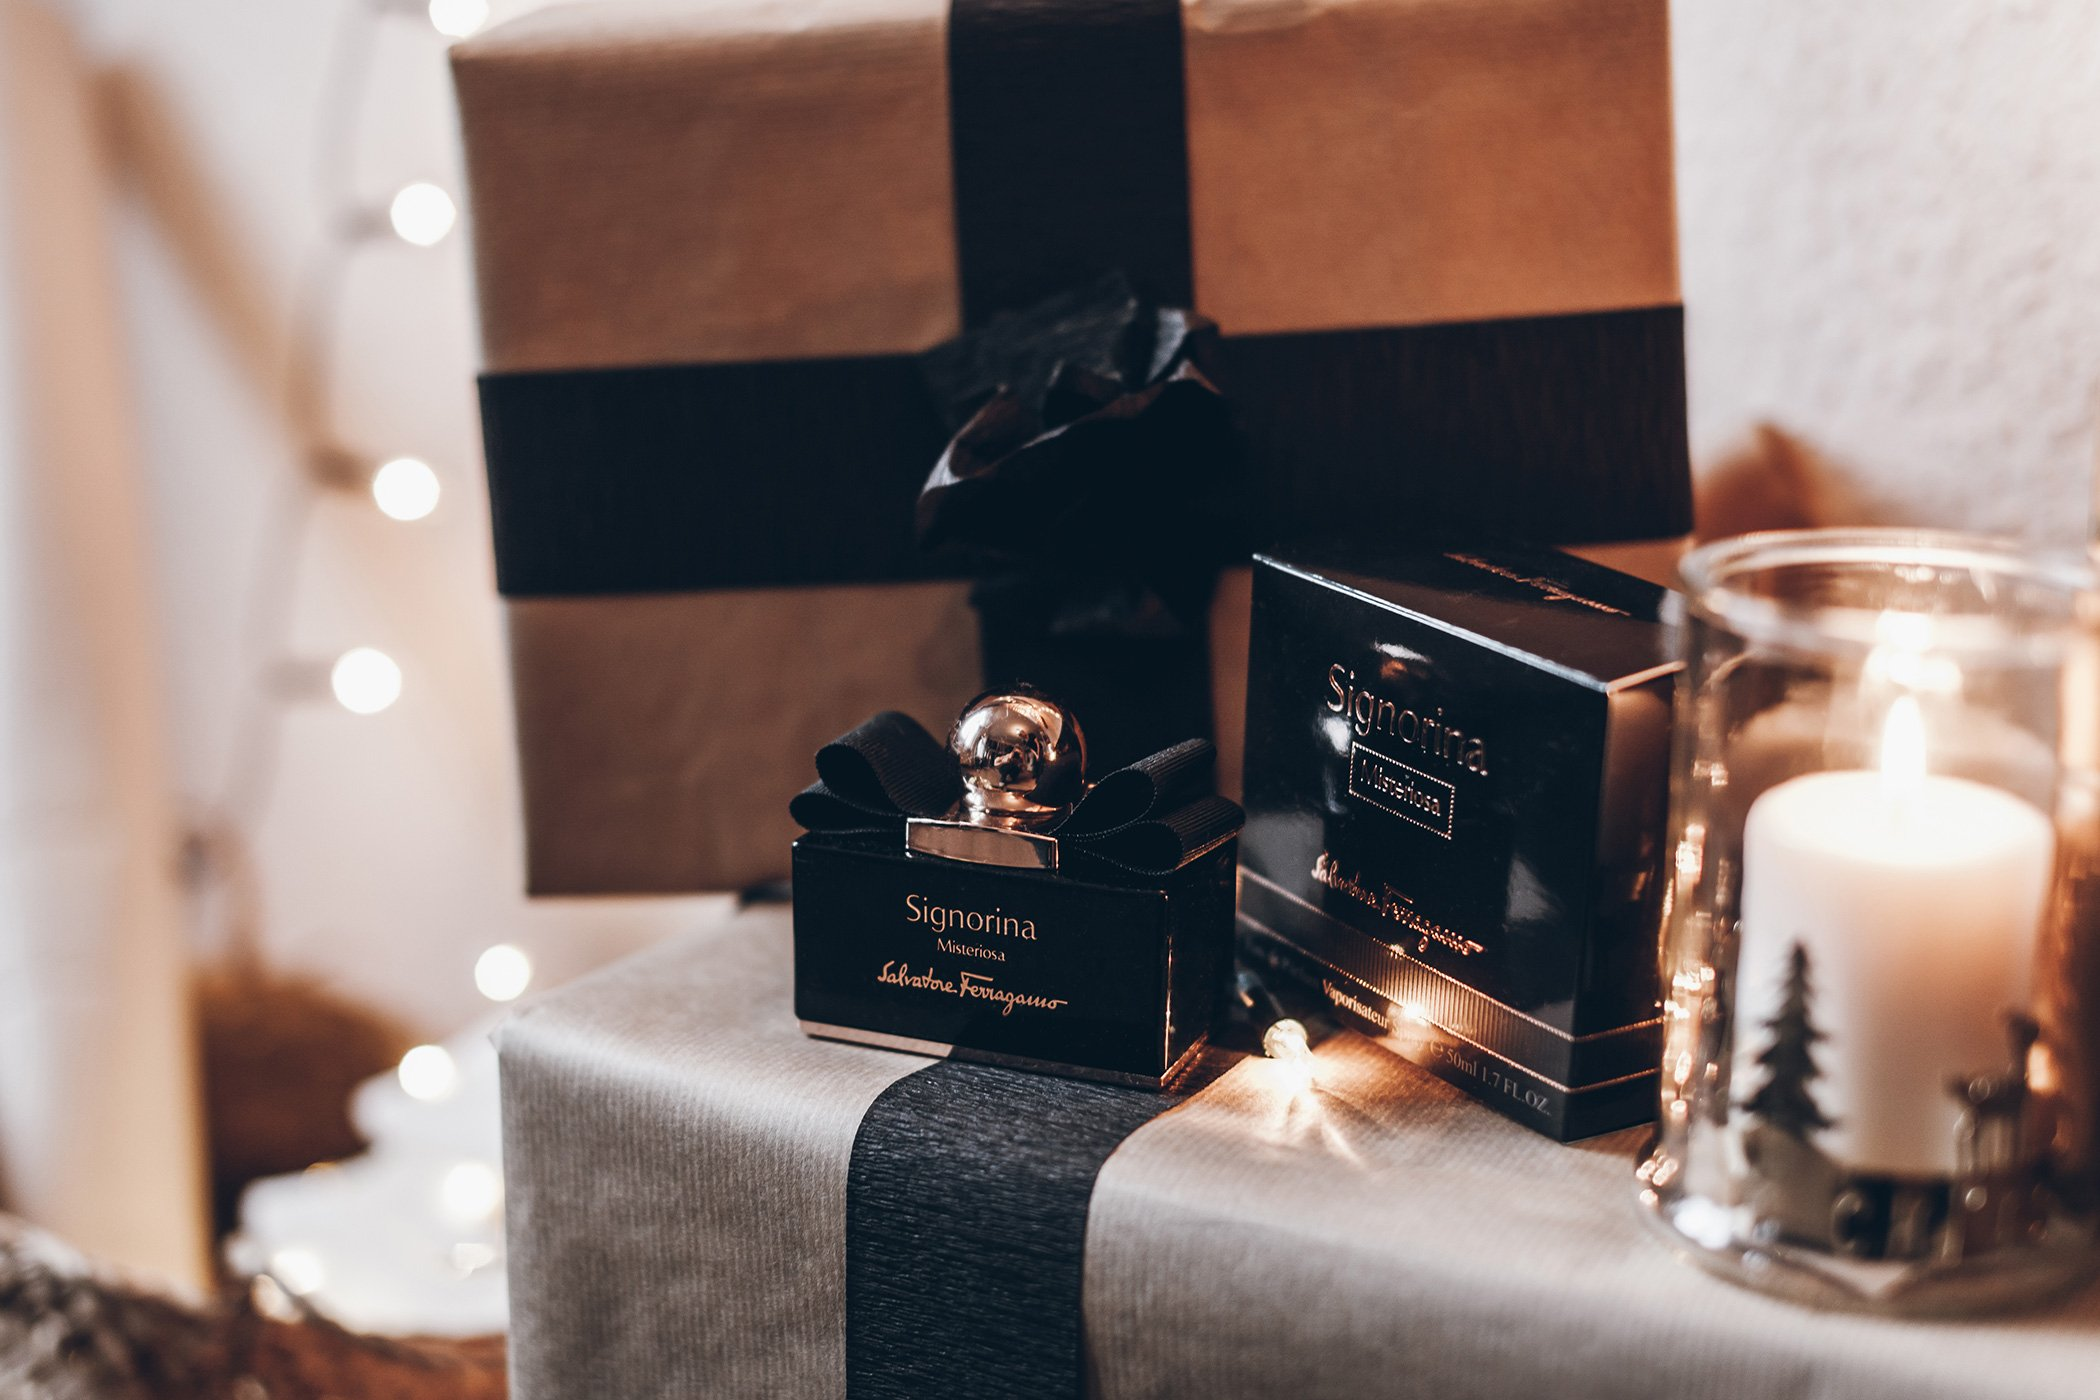 mikuta-skagen-gifting-guide-2